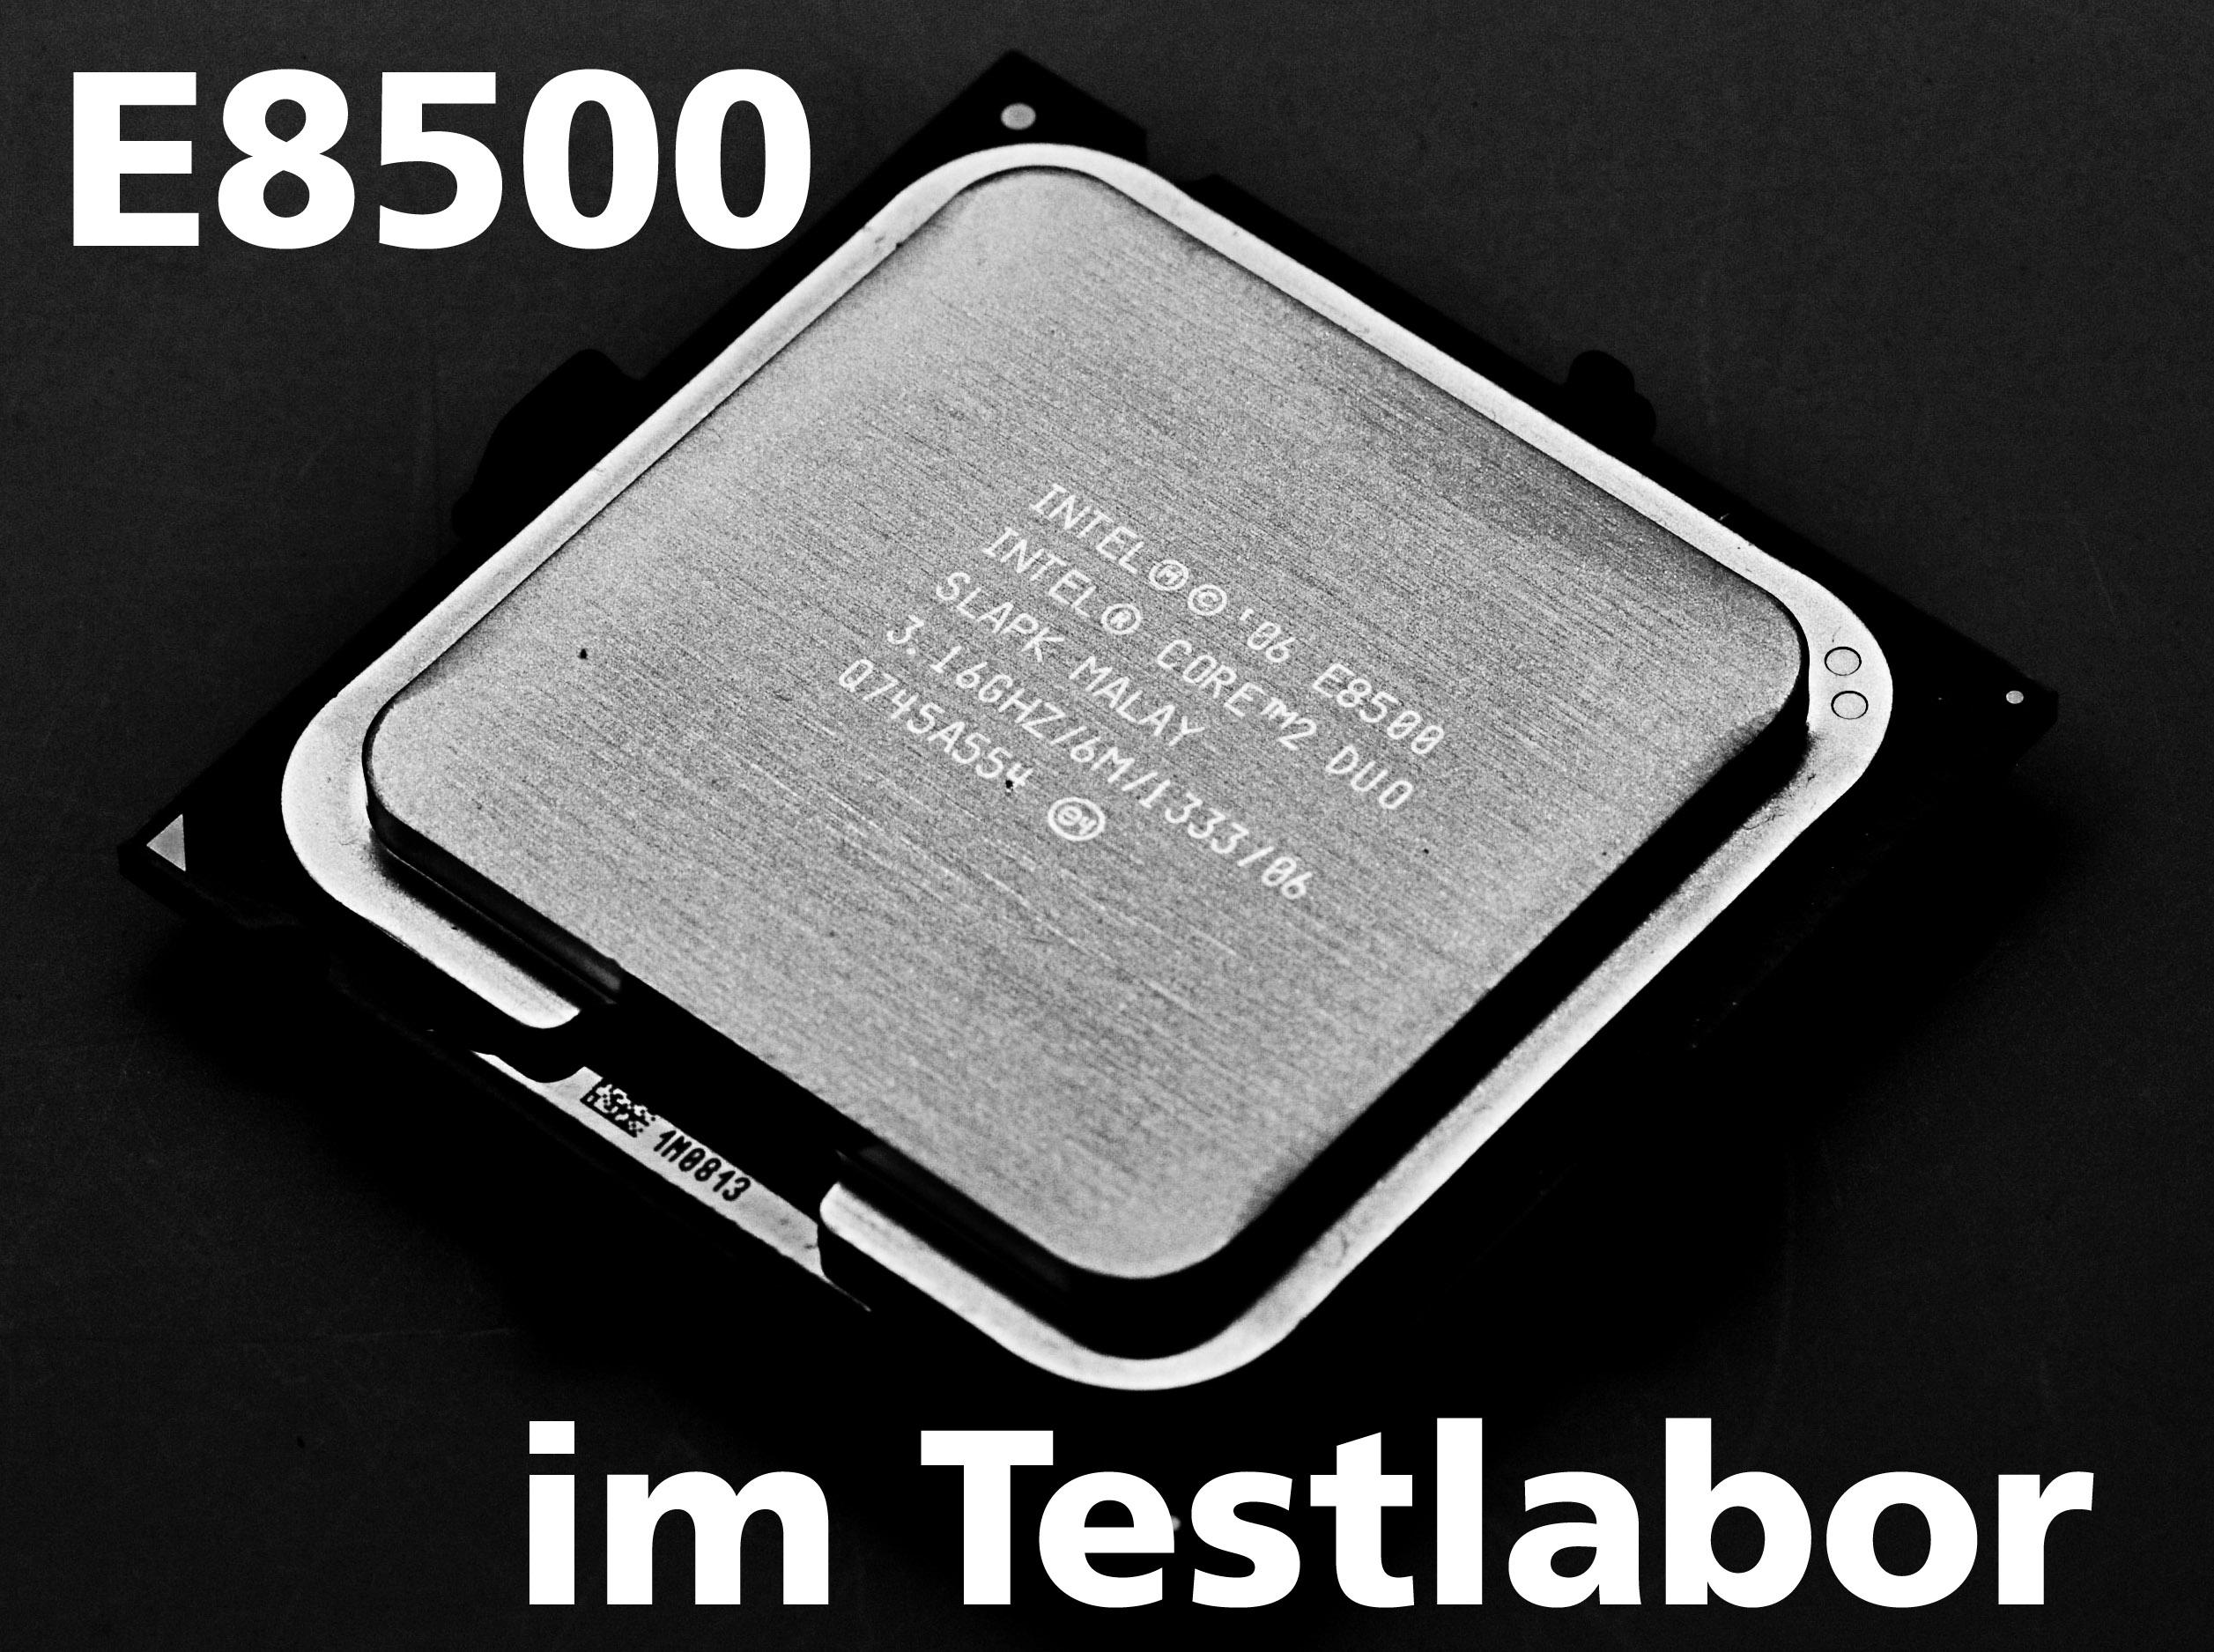 Neu Im Pcgh Test Labor Core 2 Duo E8500 In Der Retailversion Prosesor